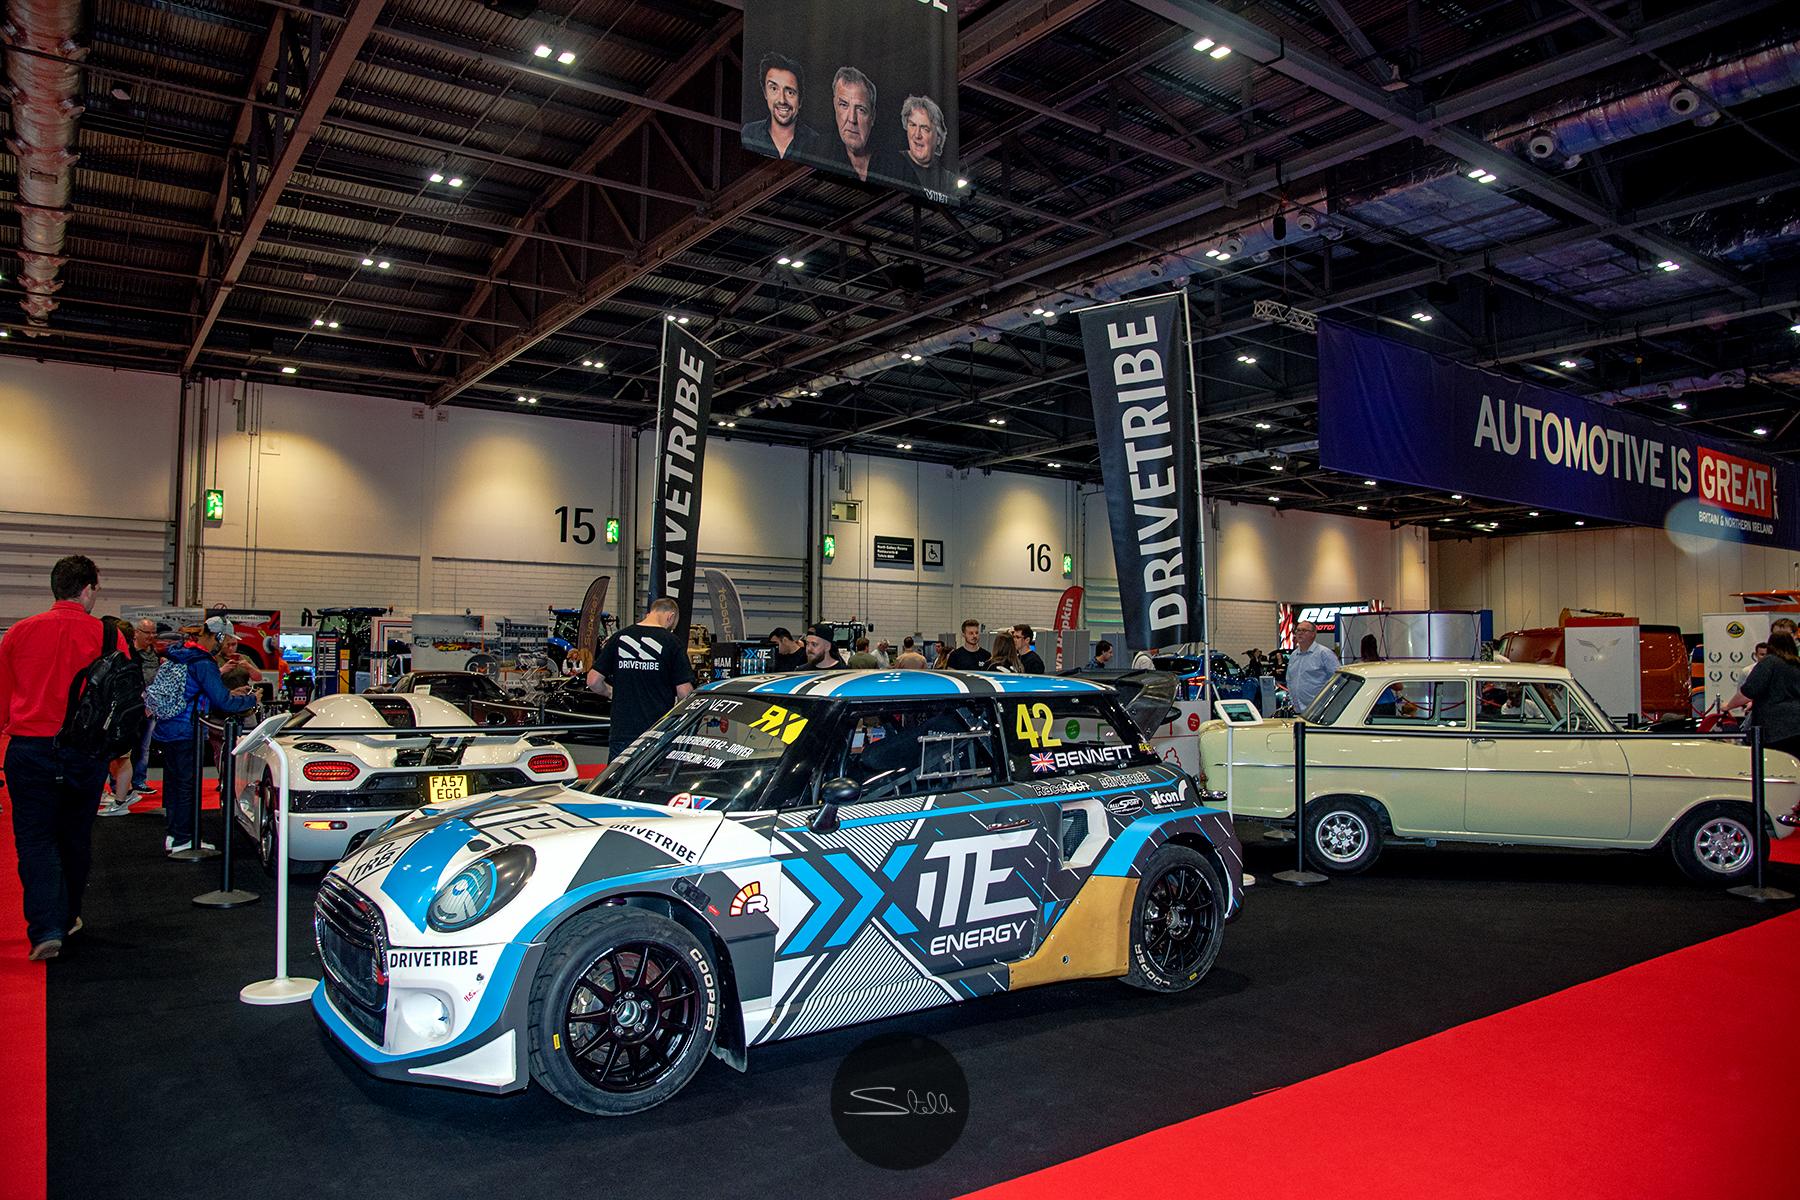 Stella Scordellis The London Motor Show 2018 1 Watermarked.jpg